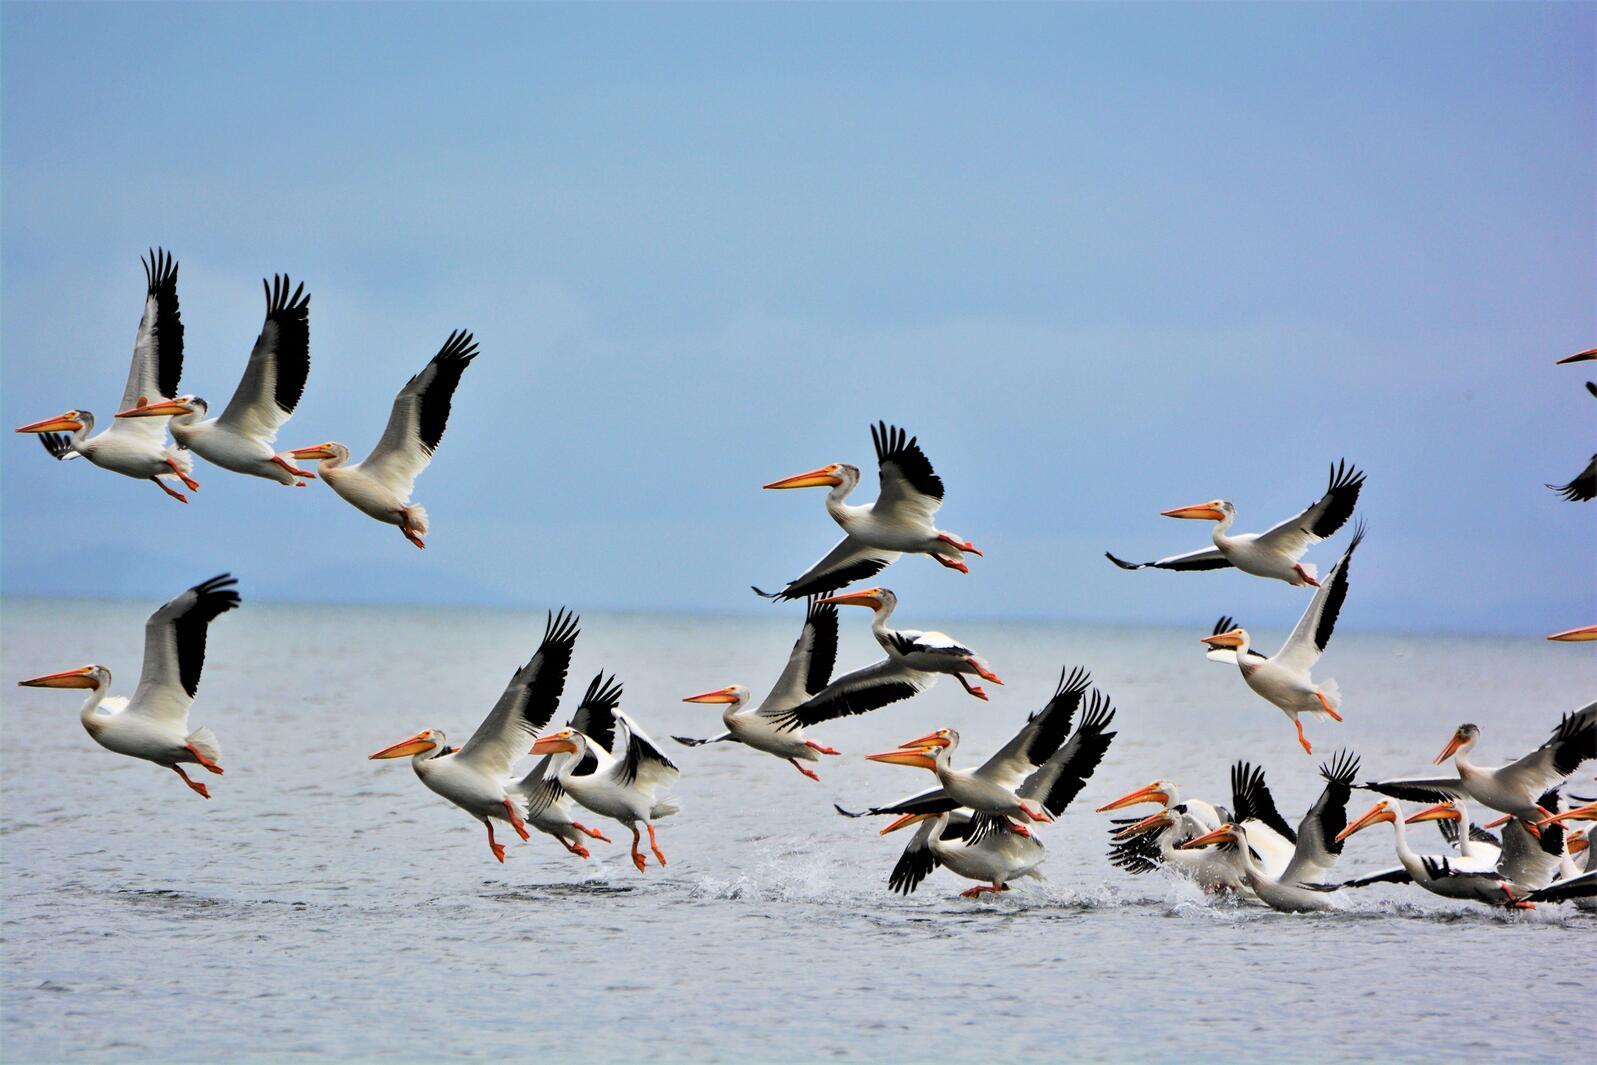 American White Pelicans. Photo: Cindy L. Fullwiler/Audubon Photography Awards.